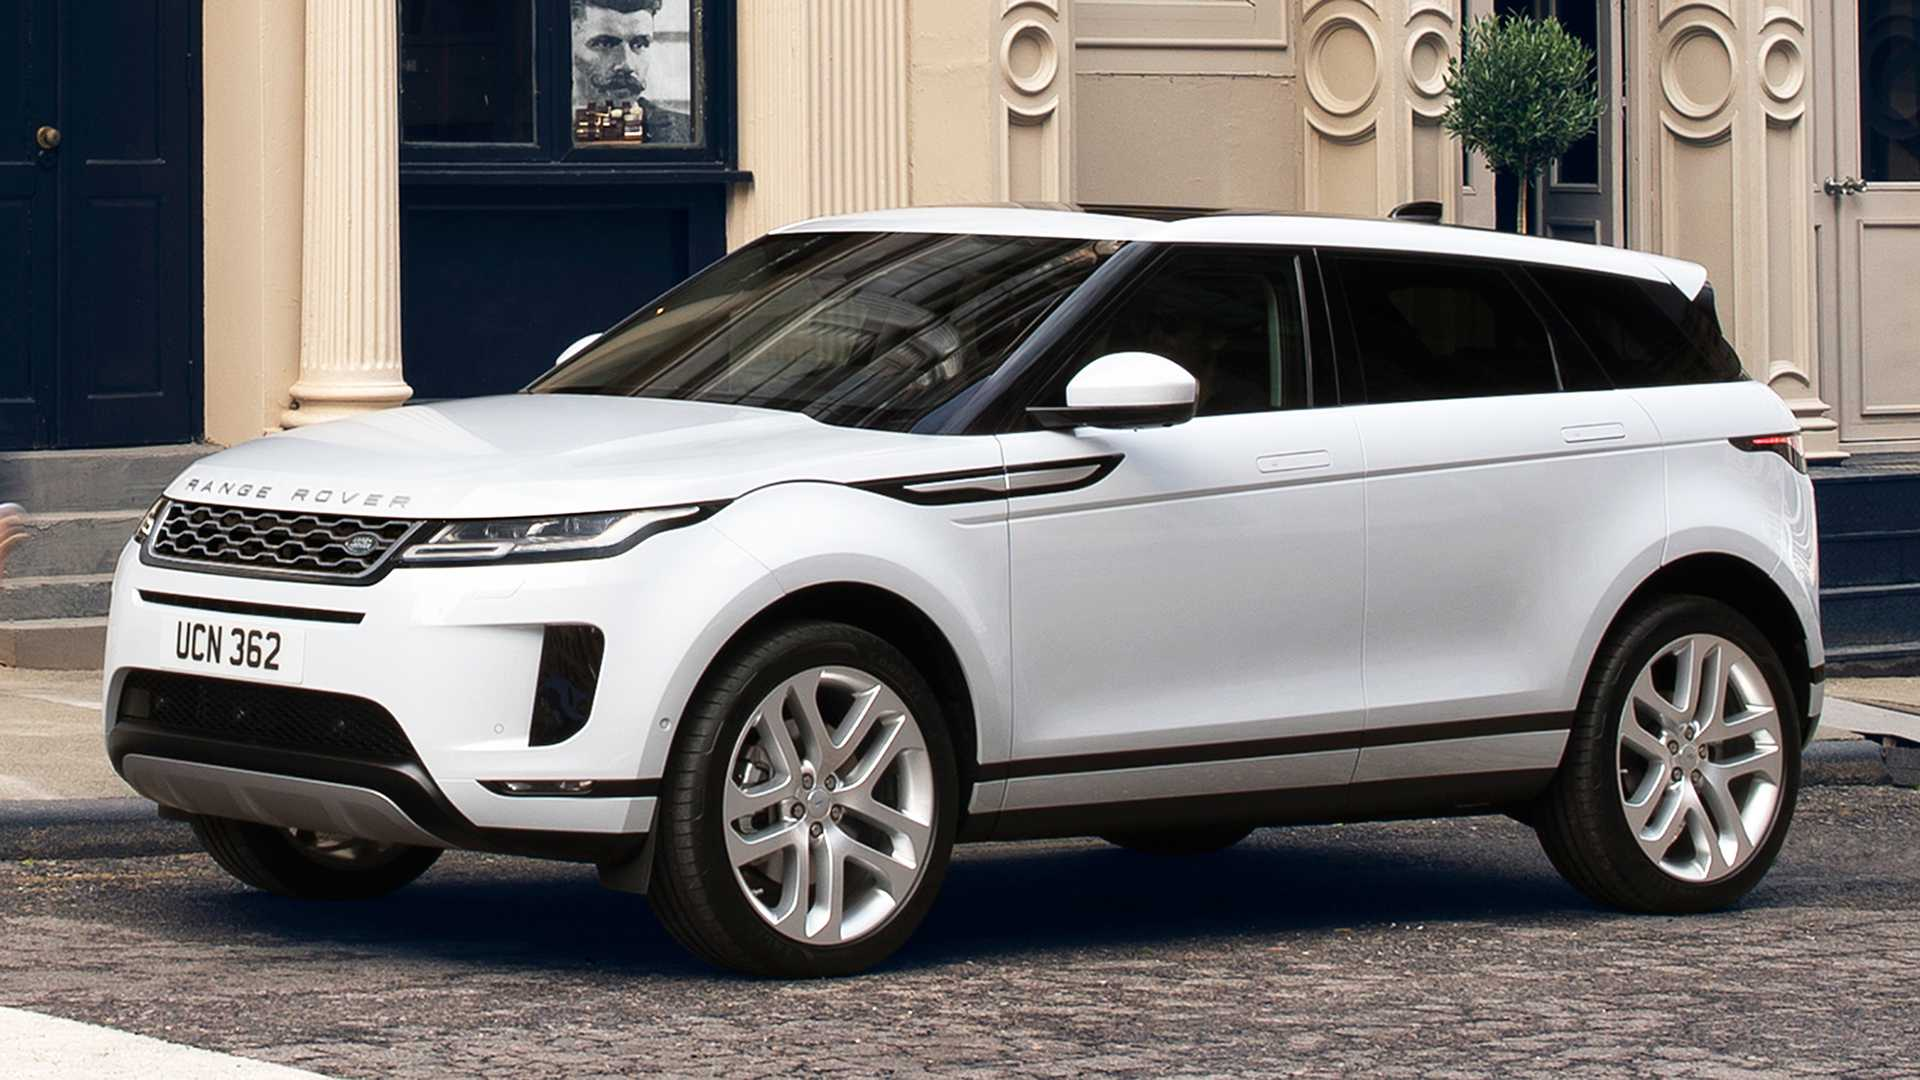 2020-range-rover-evoque (71)